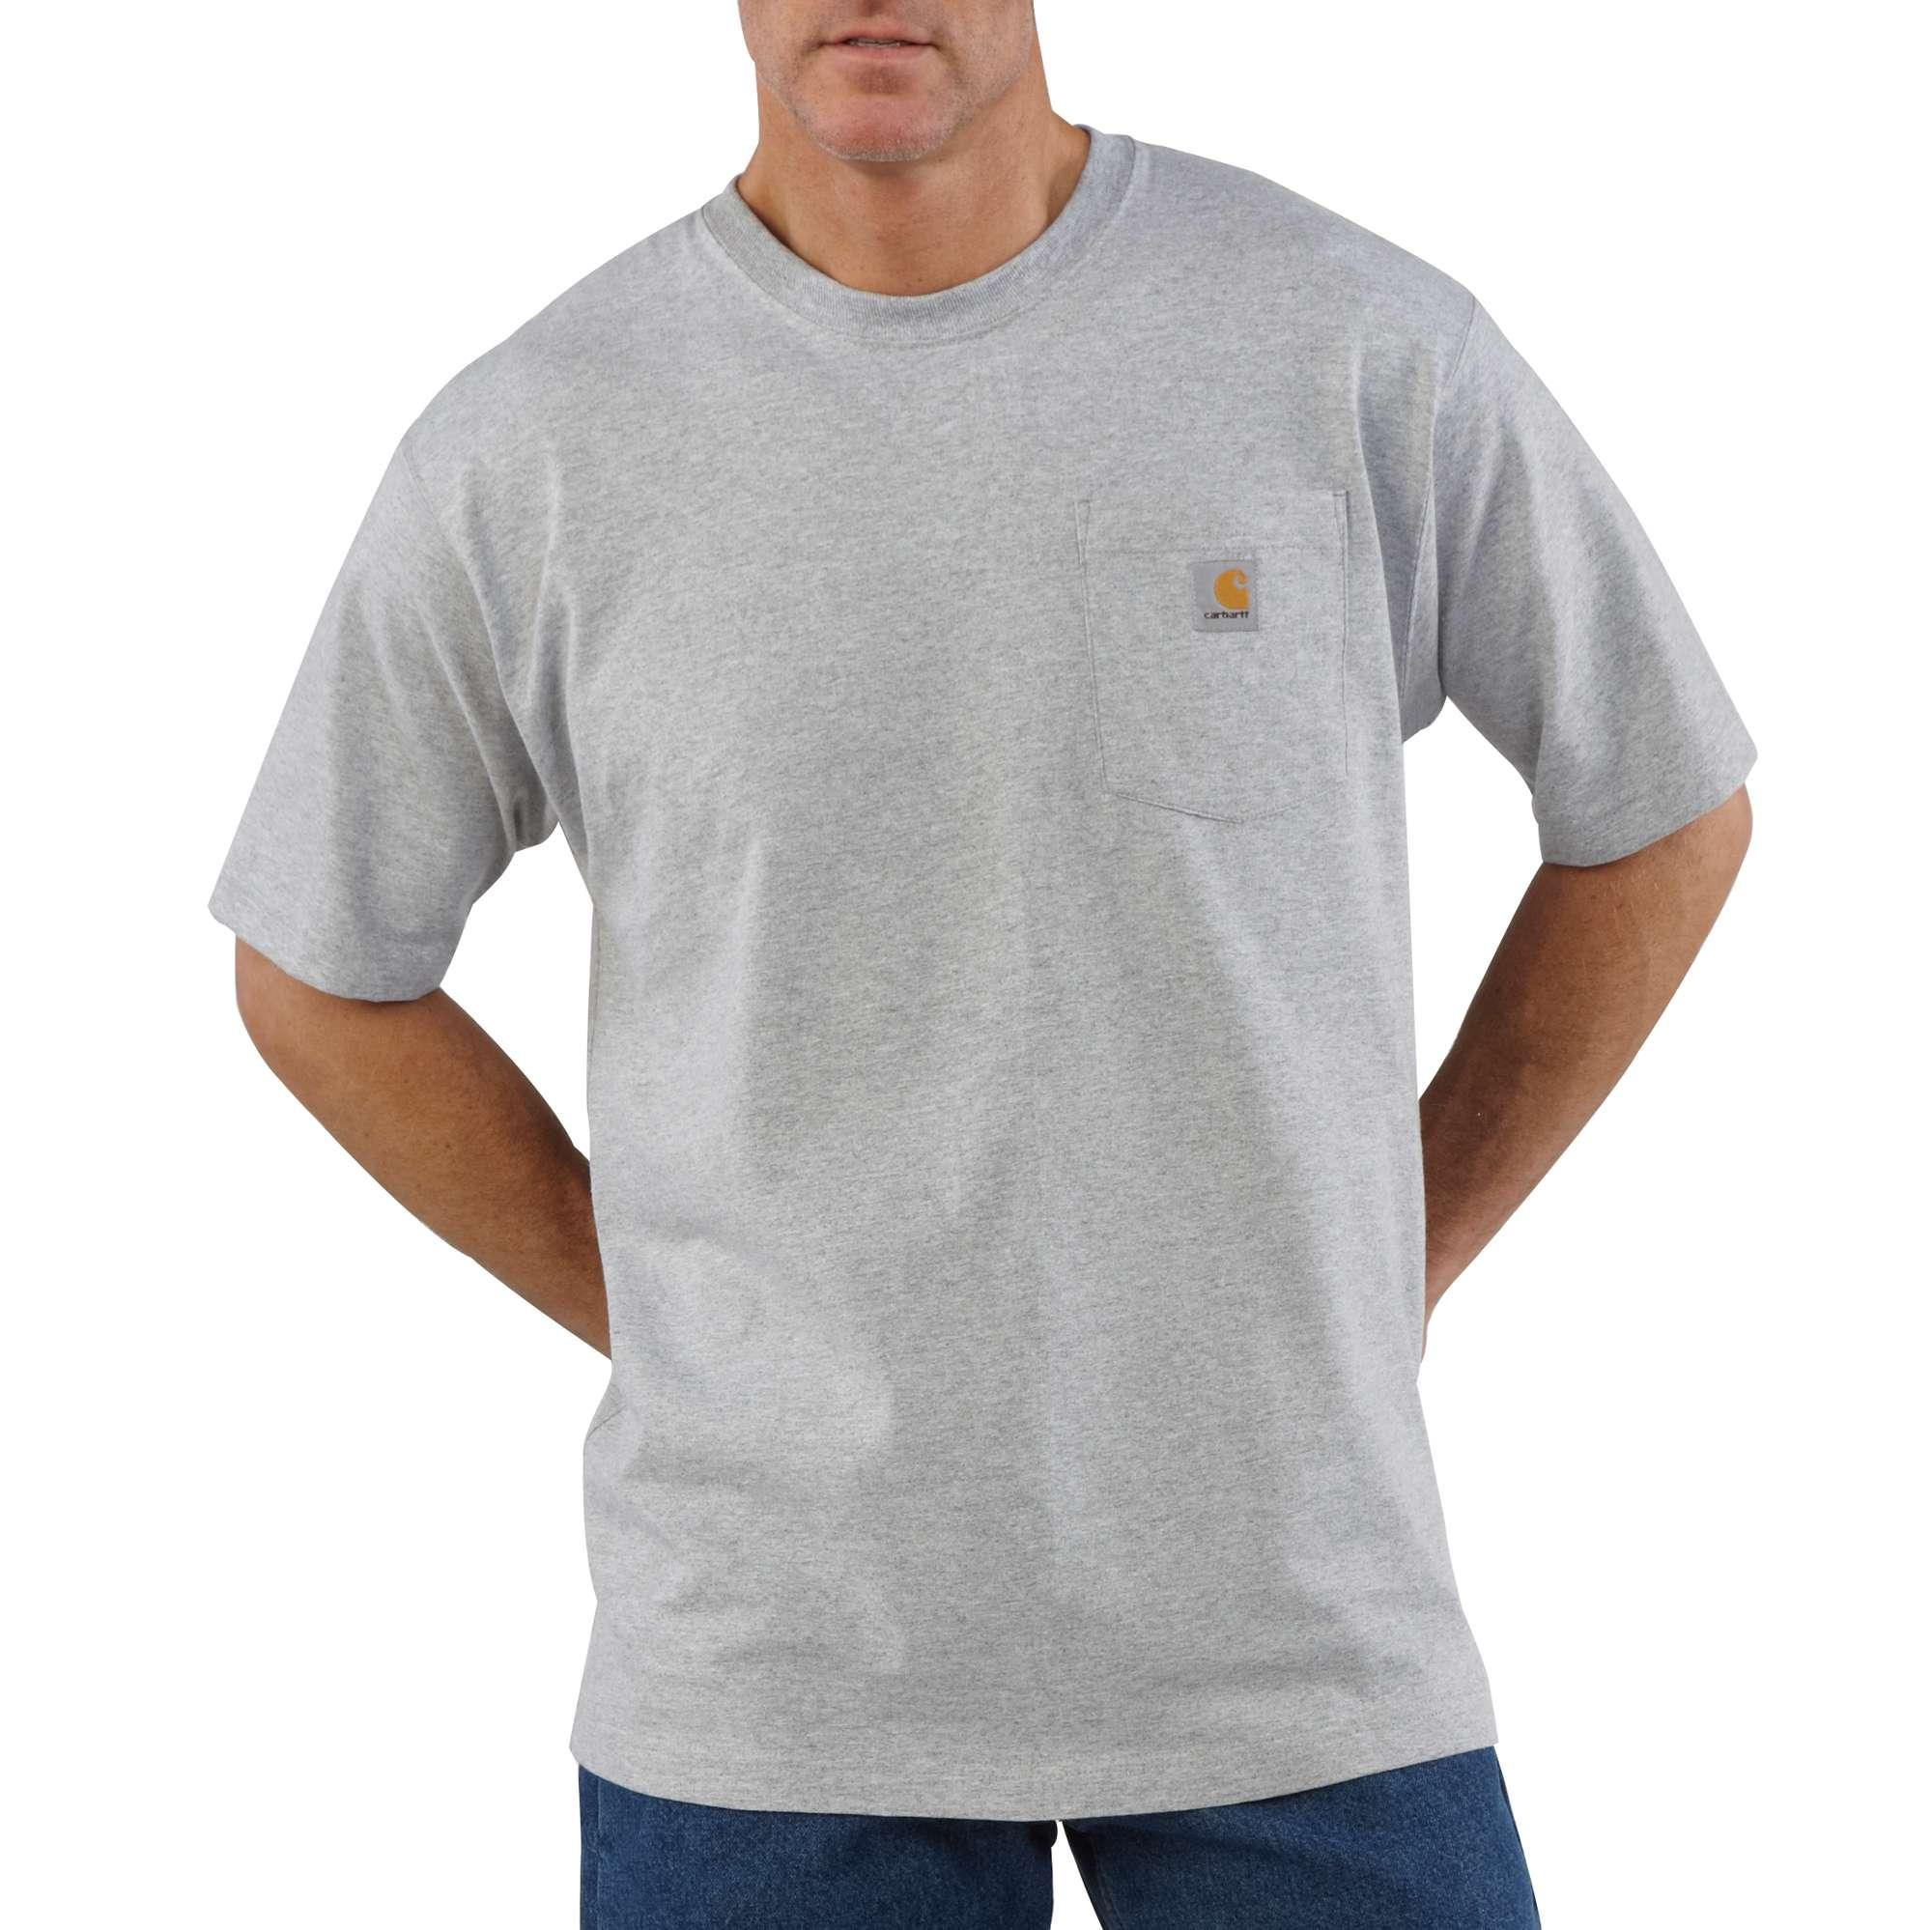 Men's Workwear Pocket Tee, Heather Gray, swatch